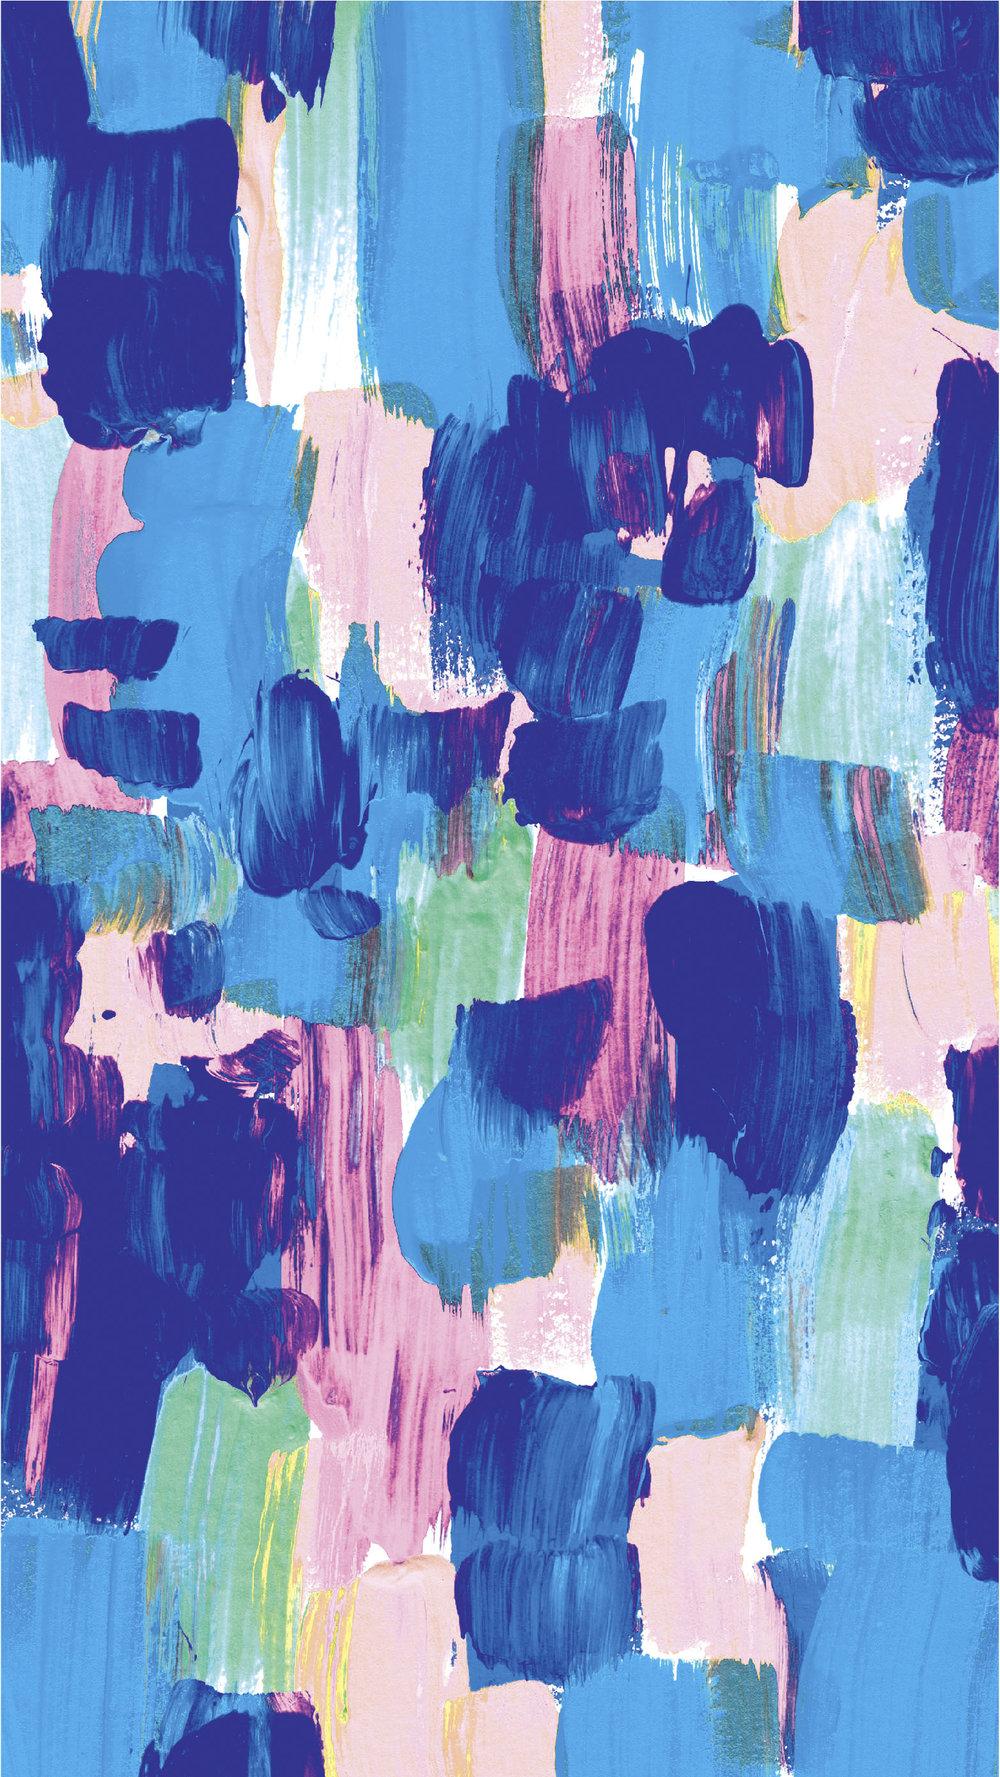 wallpaper-02.jpg